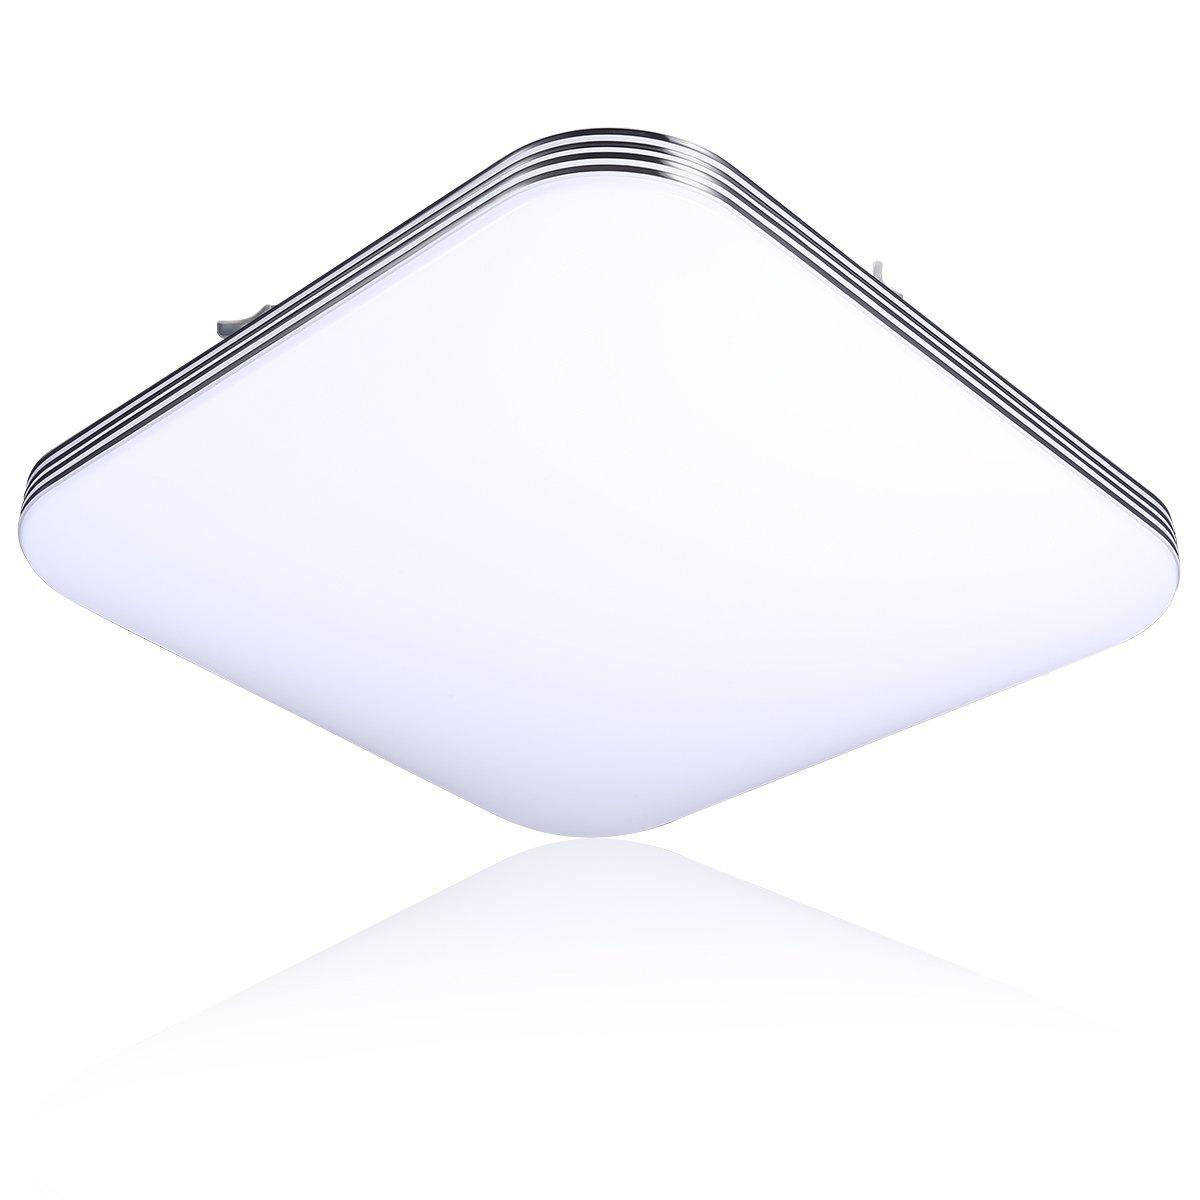 B-right 20W Square LED Flush Mount Ceiling Light, 5000K Cold White, 1400lm Super Bright, 13-Inch